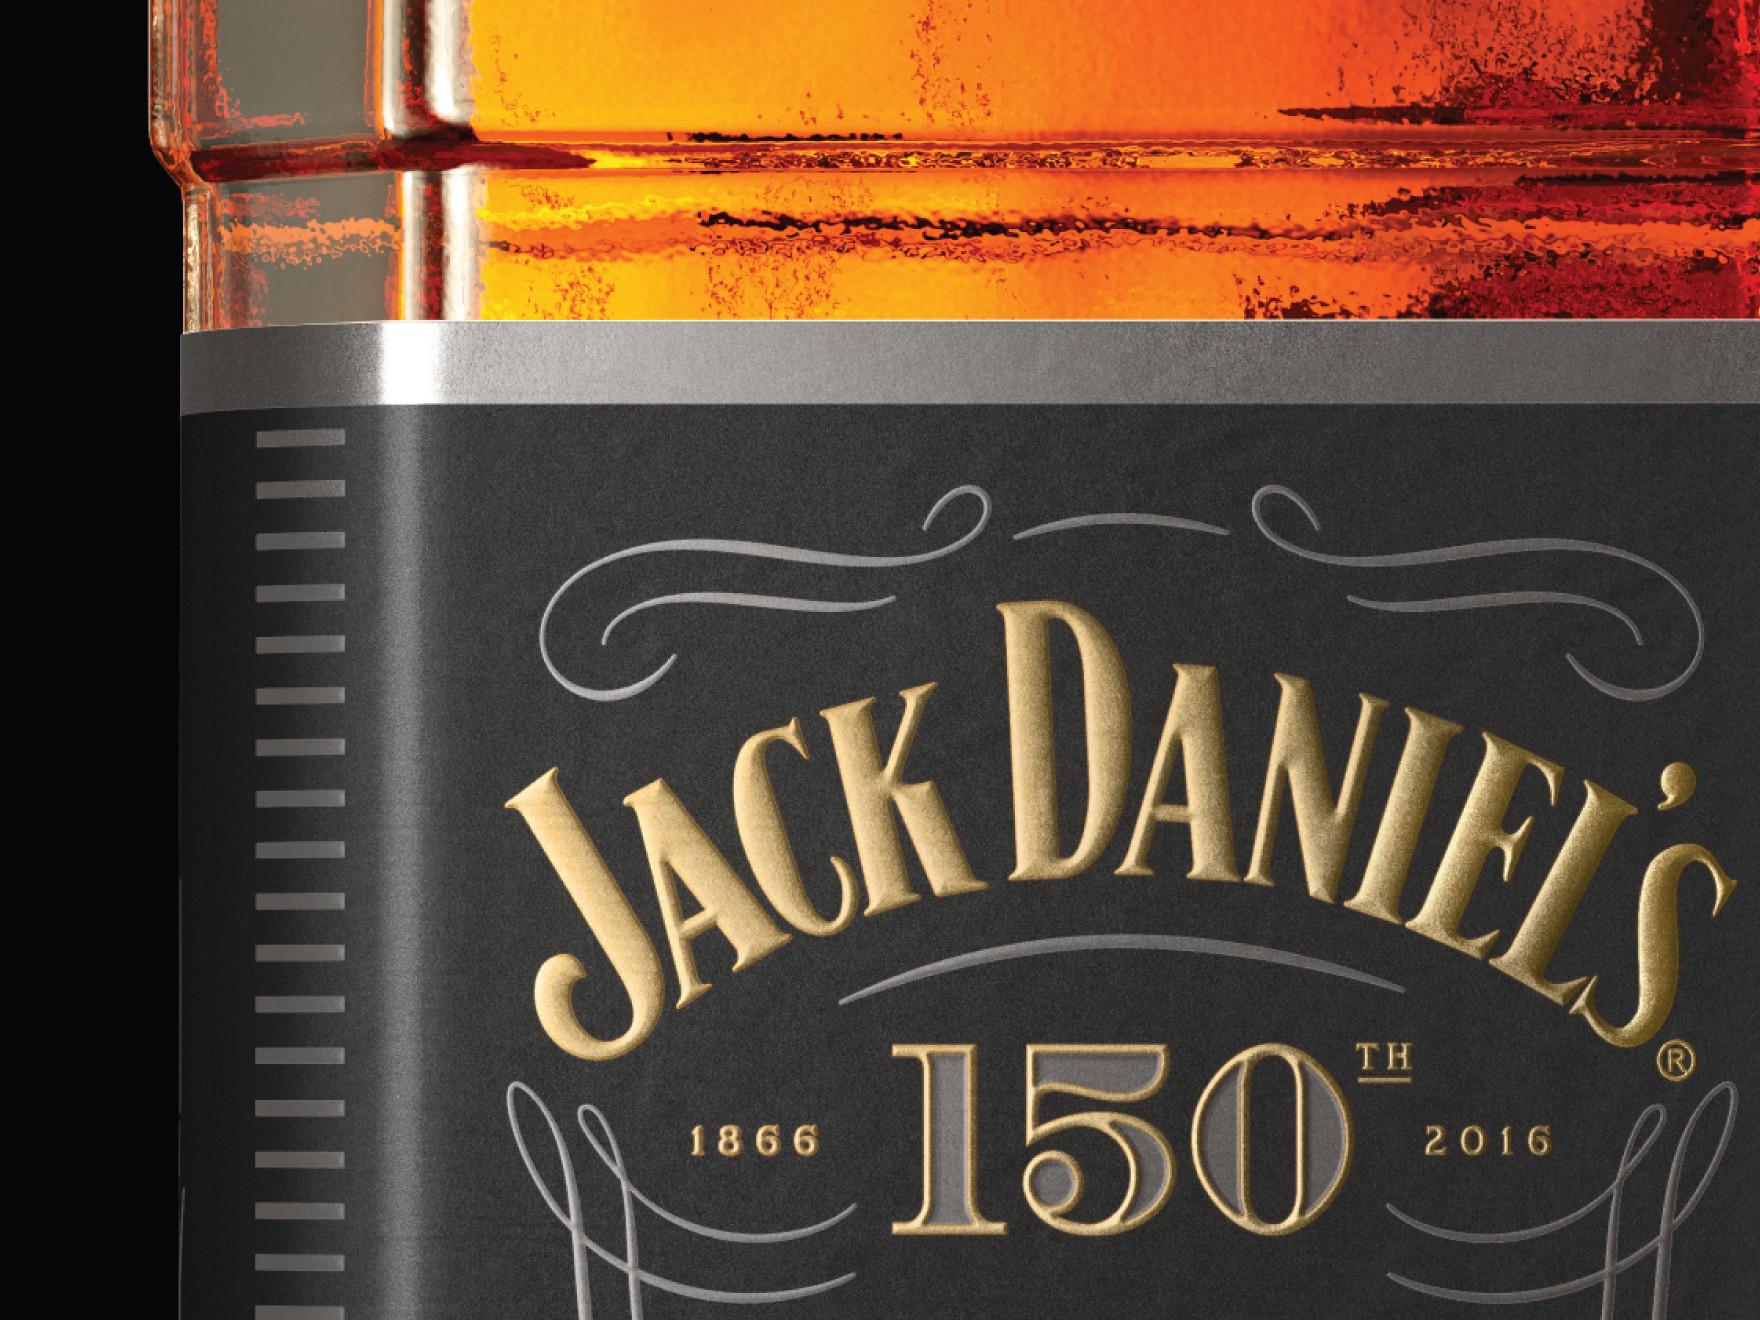 Jack Daniel's 150th Anniversary | Erickson Design Co.